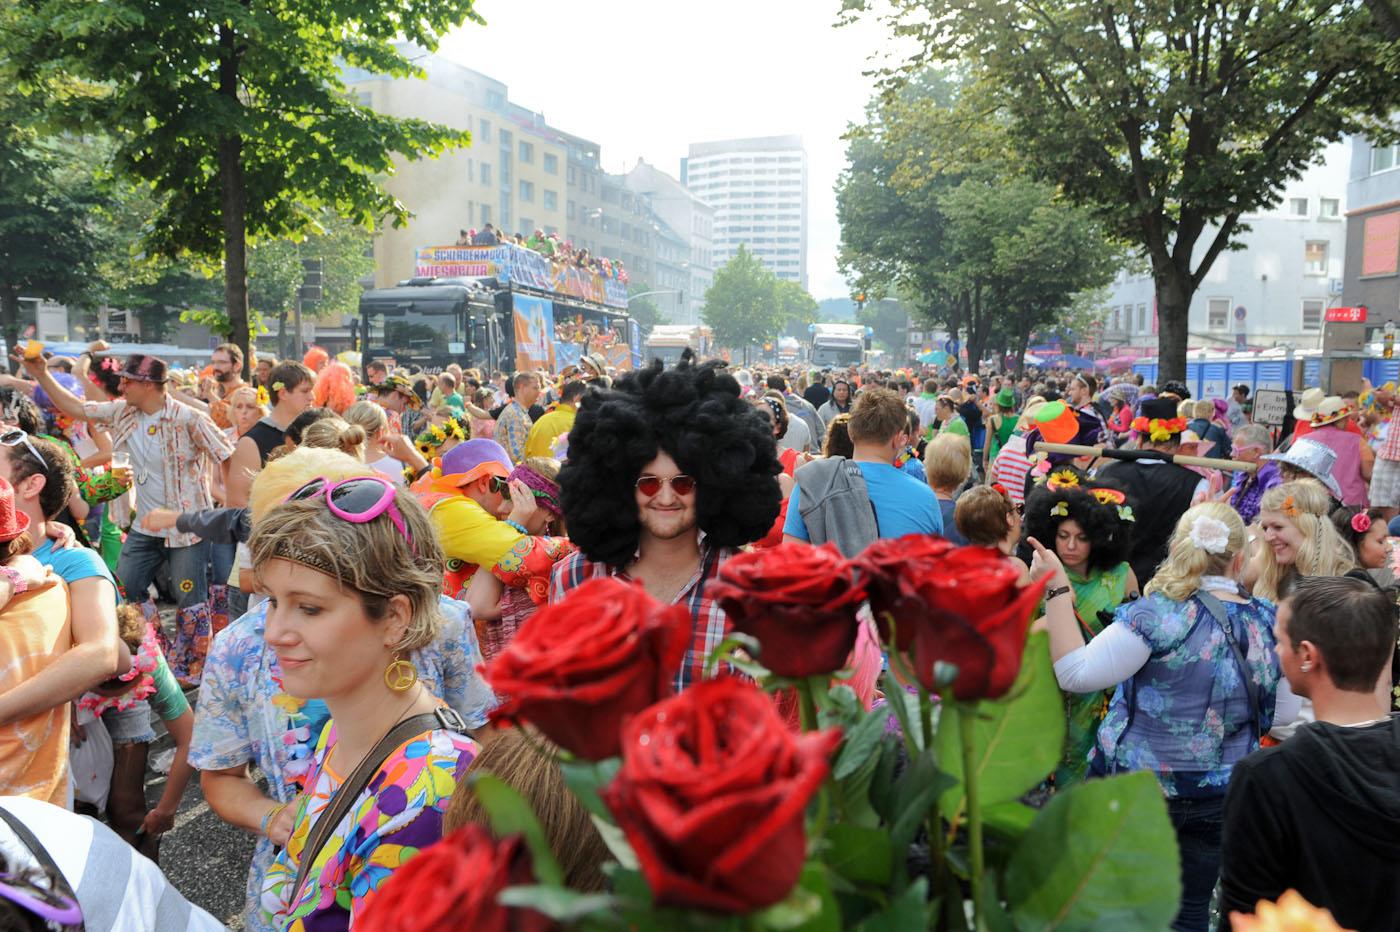 Foto ID 14070705 Schlagermove Hamburg St. Pauli